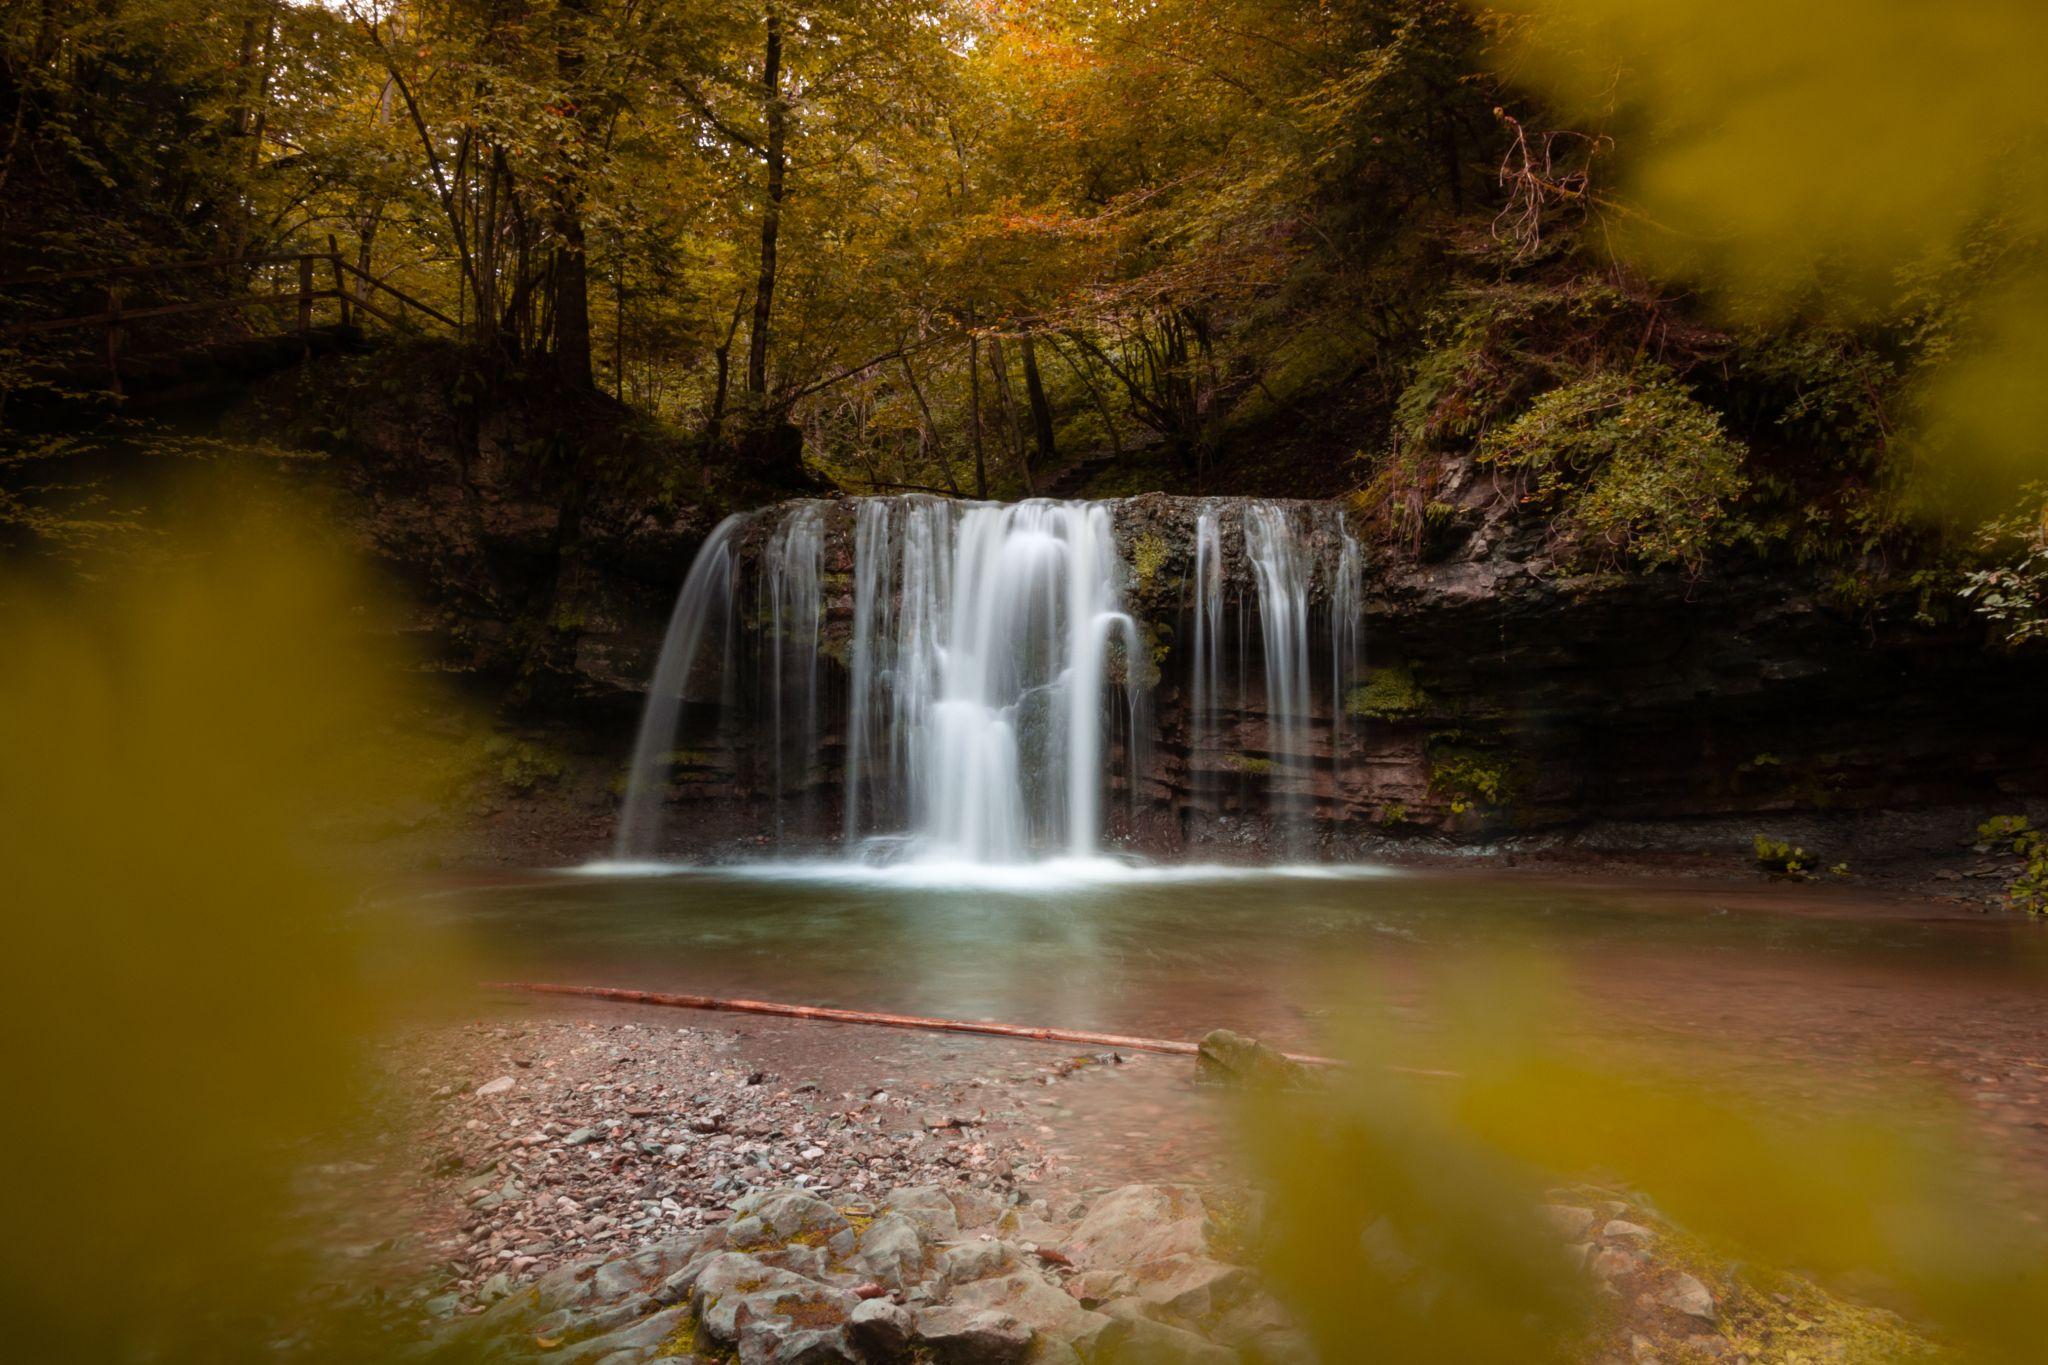 Peračica waterfall, Slovenia